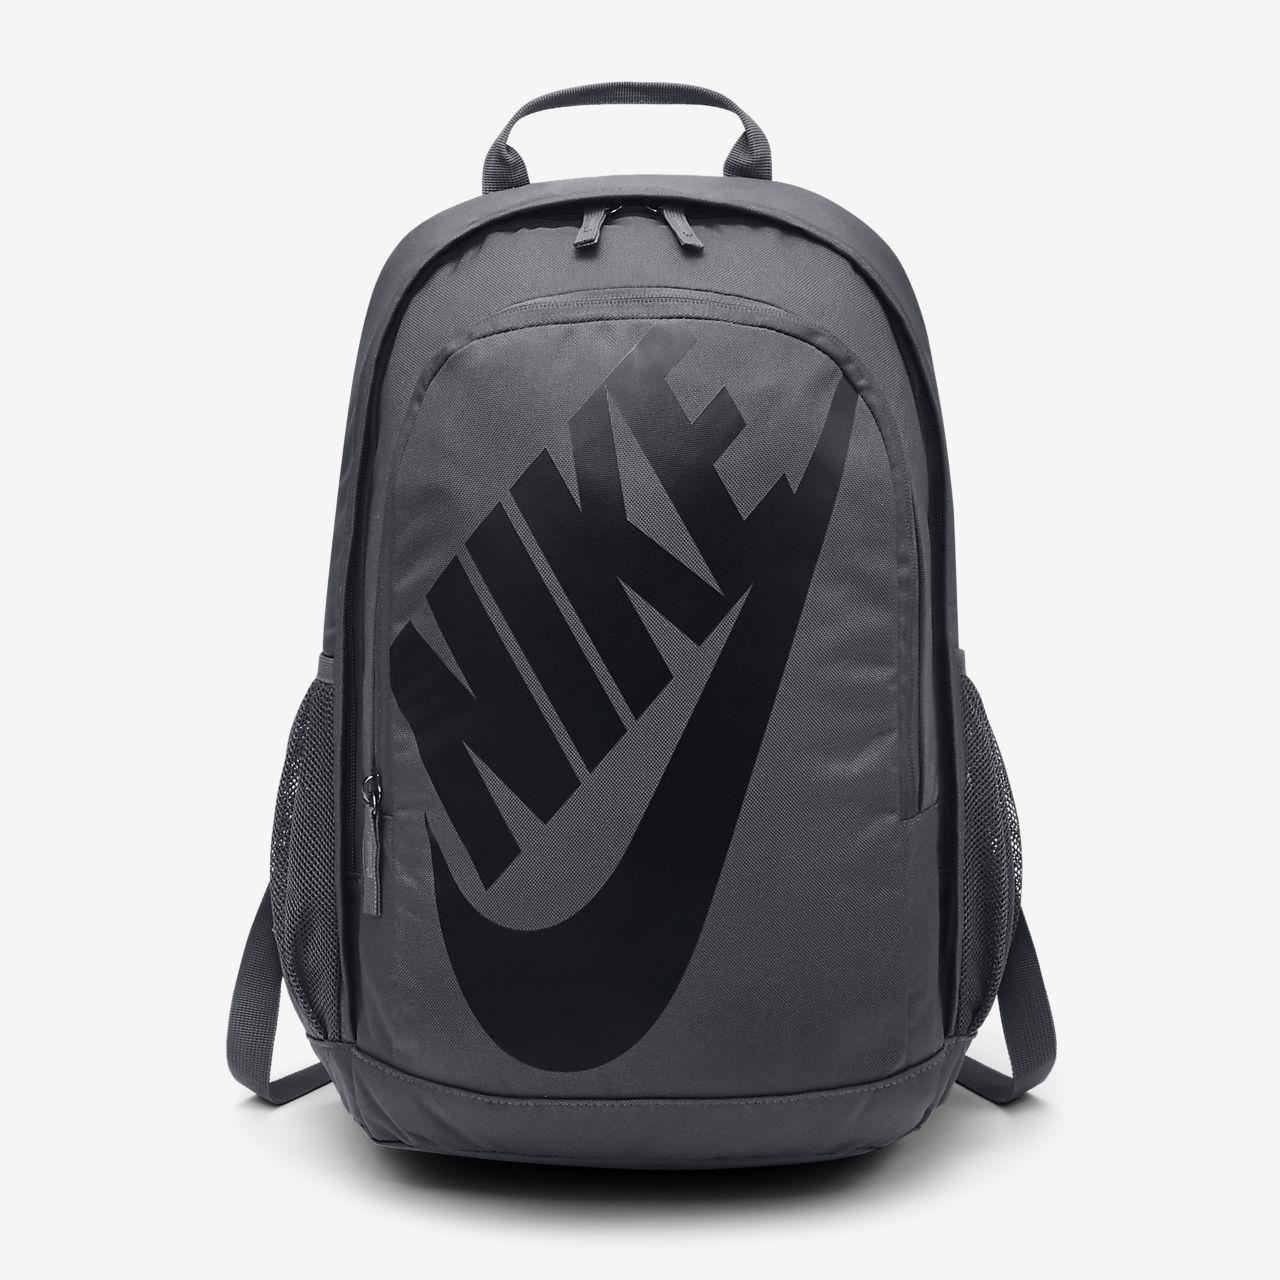 6cbc49d9a Mochila Nike Sportswear Hayward Futura 2.0. Nike.com PT